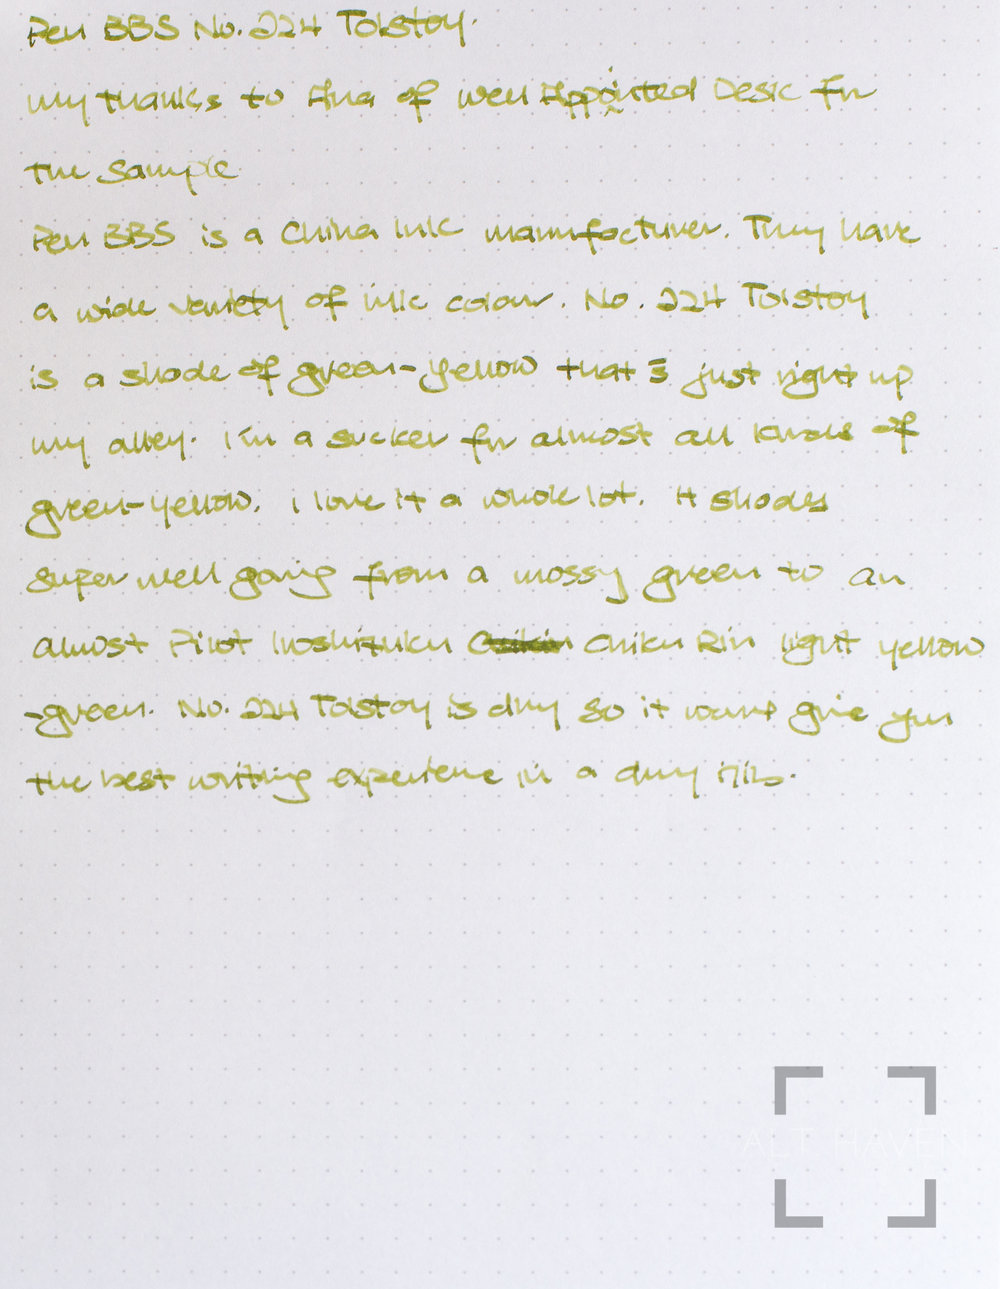 PenBBS No 224 Tolstoy-2.jpg